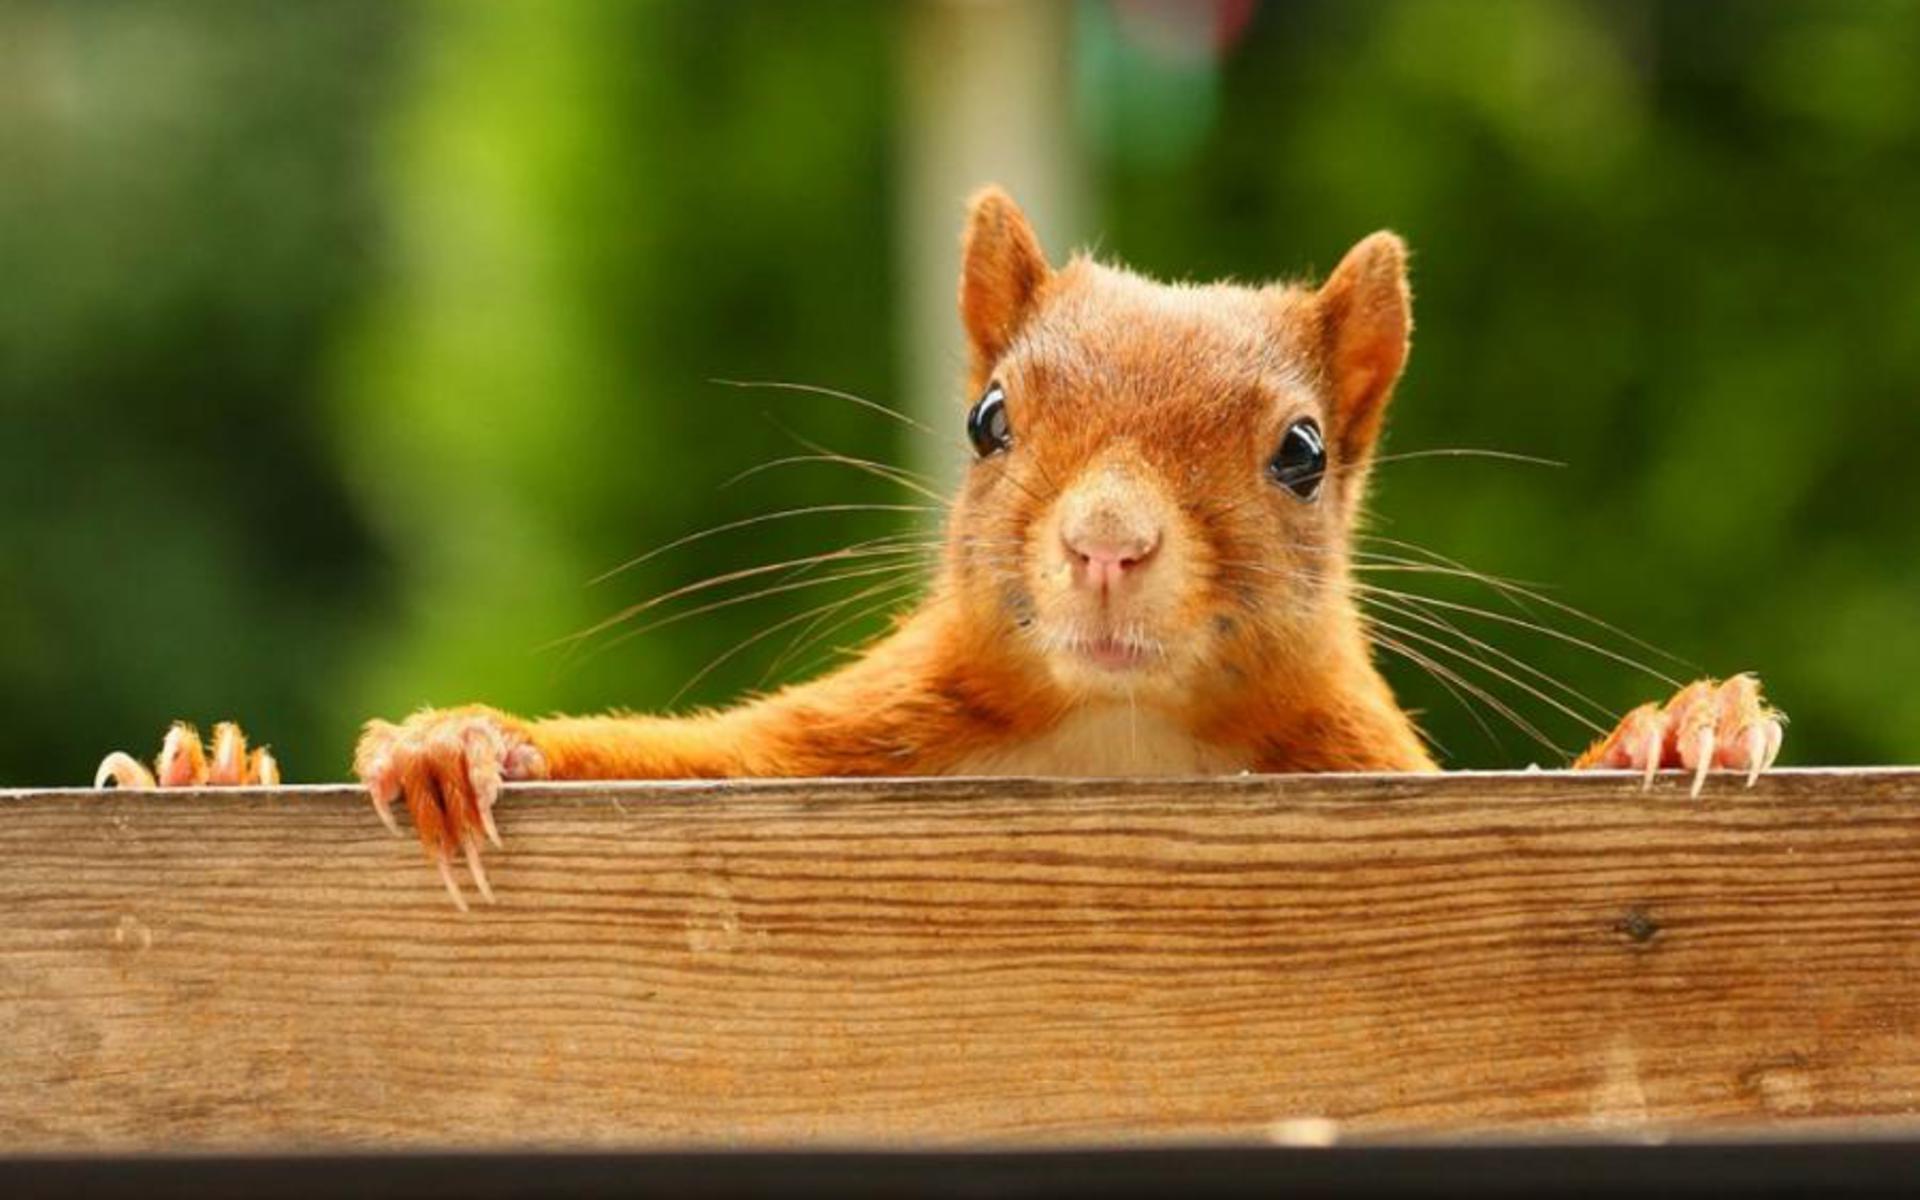 Cute Baby Hedgehog Wallpaper Squirrel Wallpapers Best Wallpapers